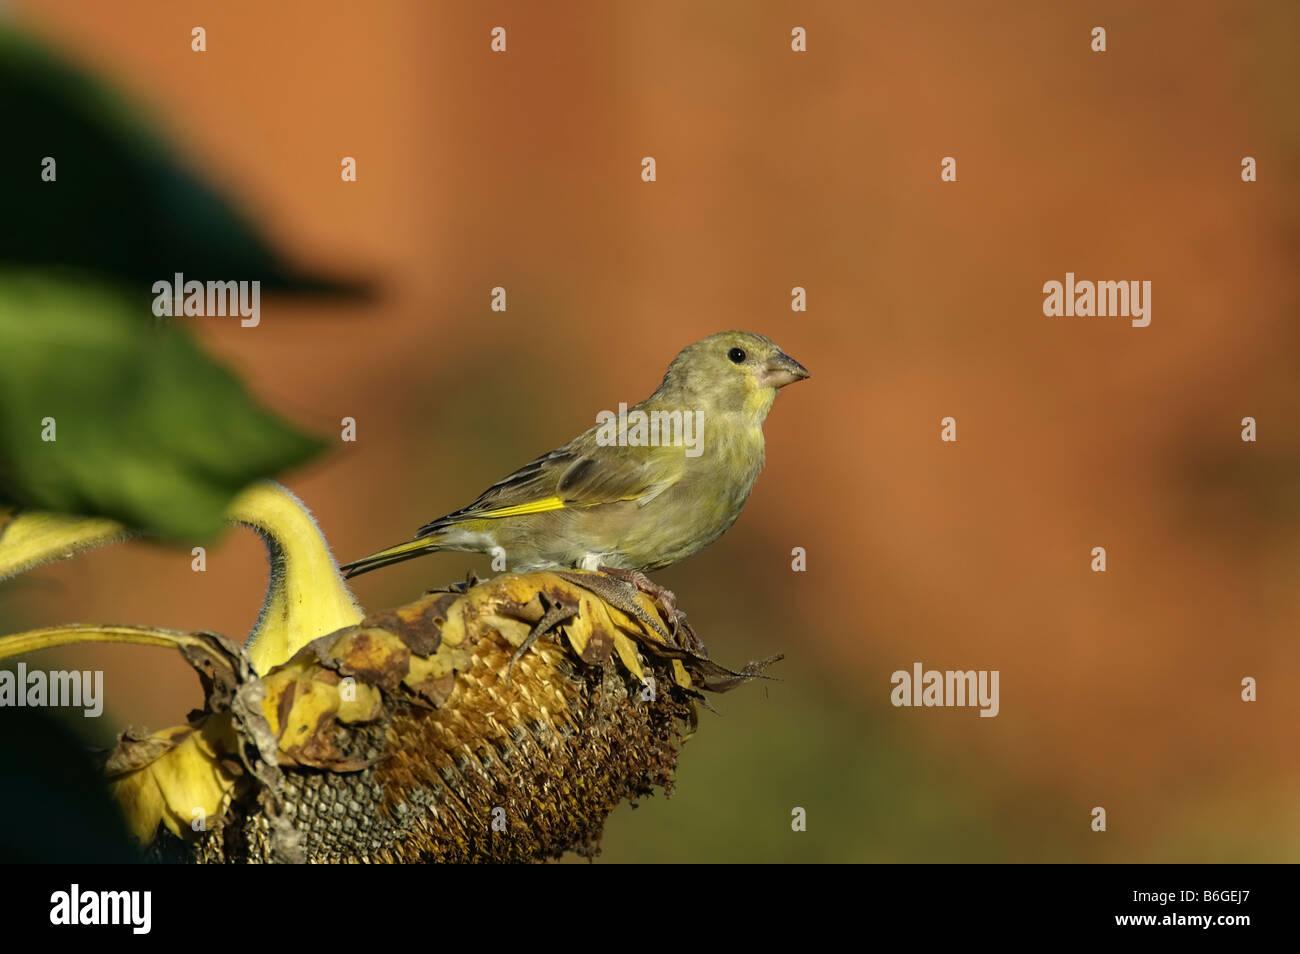 Greenfinch Carduelis chloris passerine - Stock Image